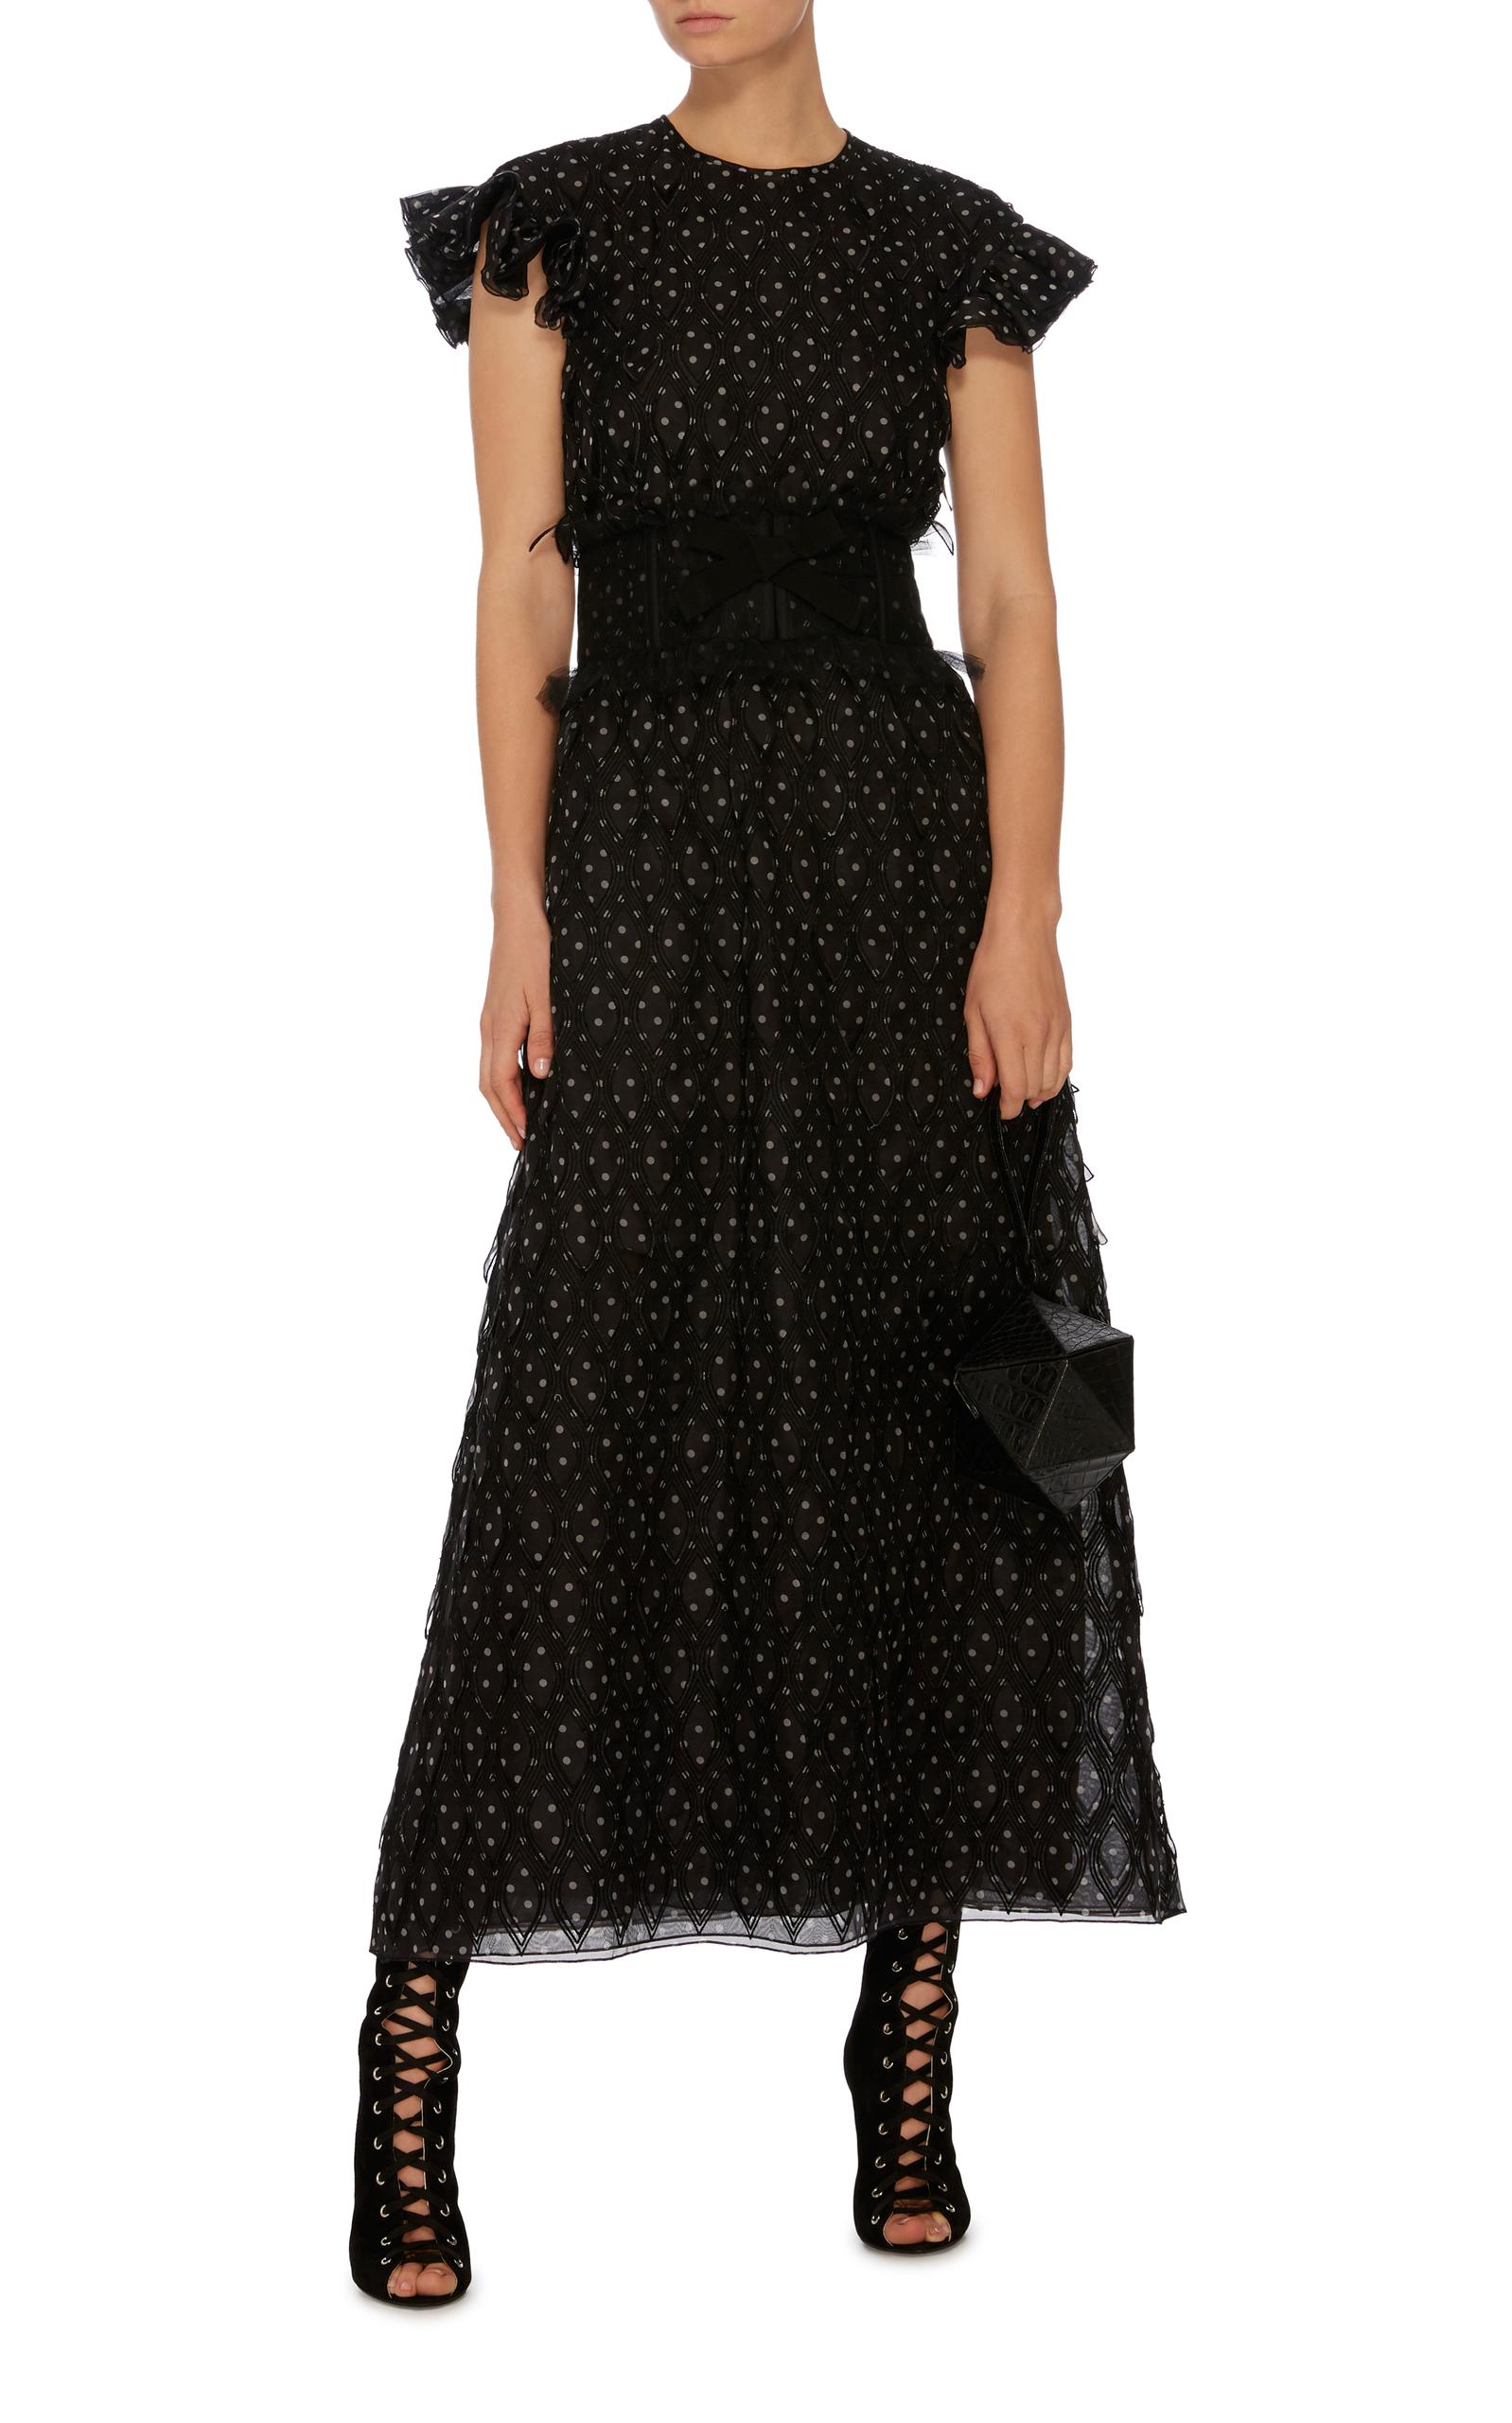 246fce8cae1 Giambattista ValliFlutter Sleeve Polka Dot Dress. CLOSE. Loading